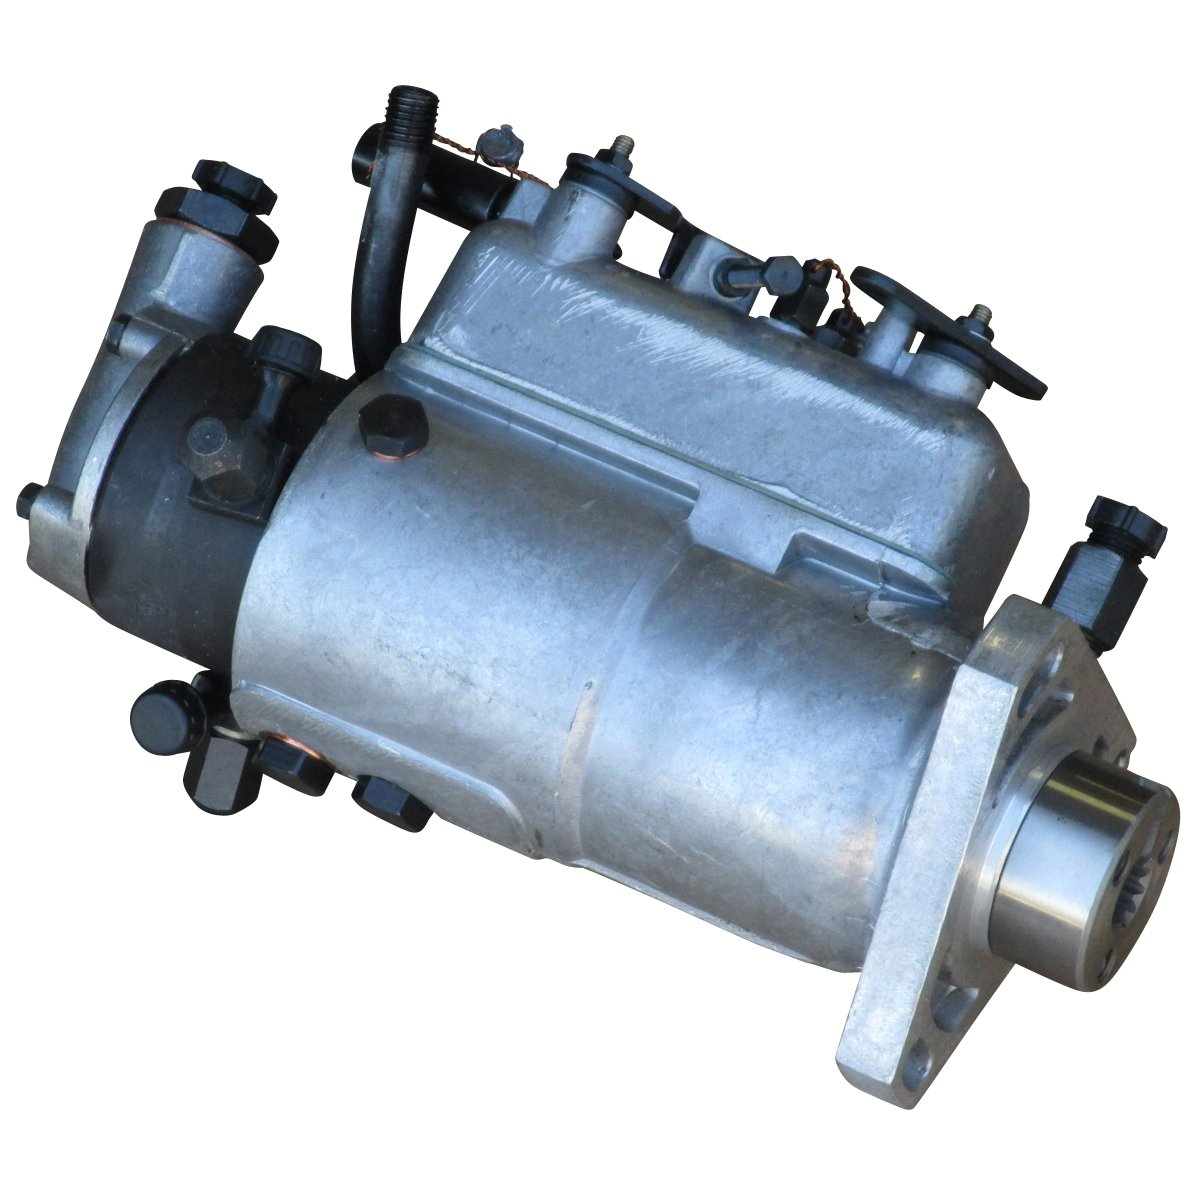 Hamiltonbobs Premium Quality Fuel Injector Injection Pump Massey Ferguson MF...